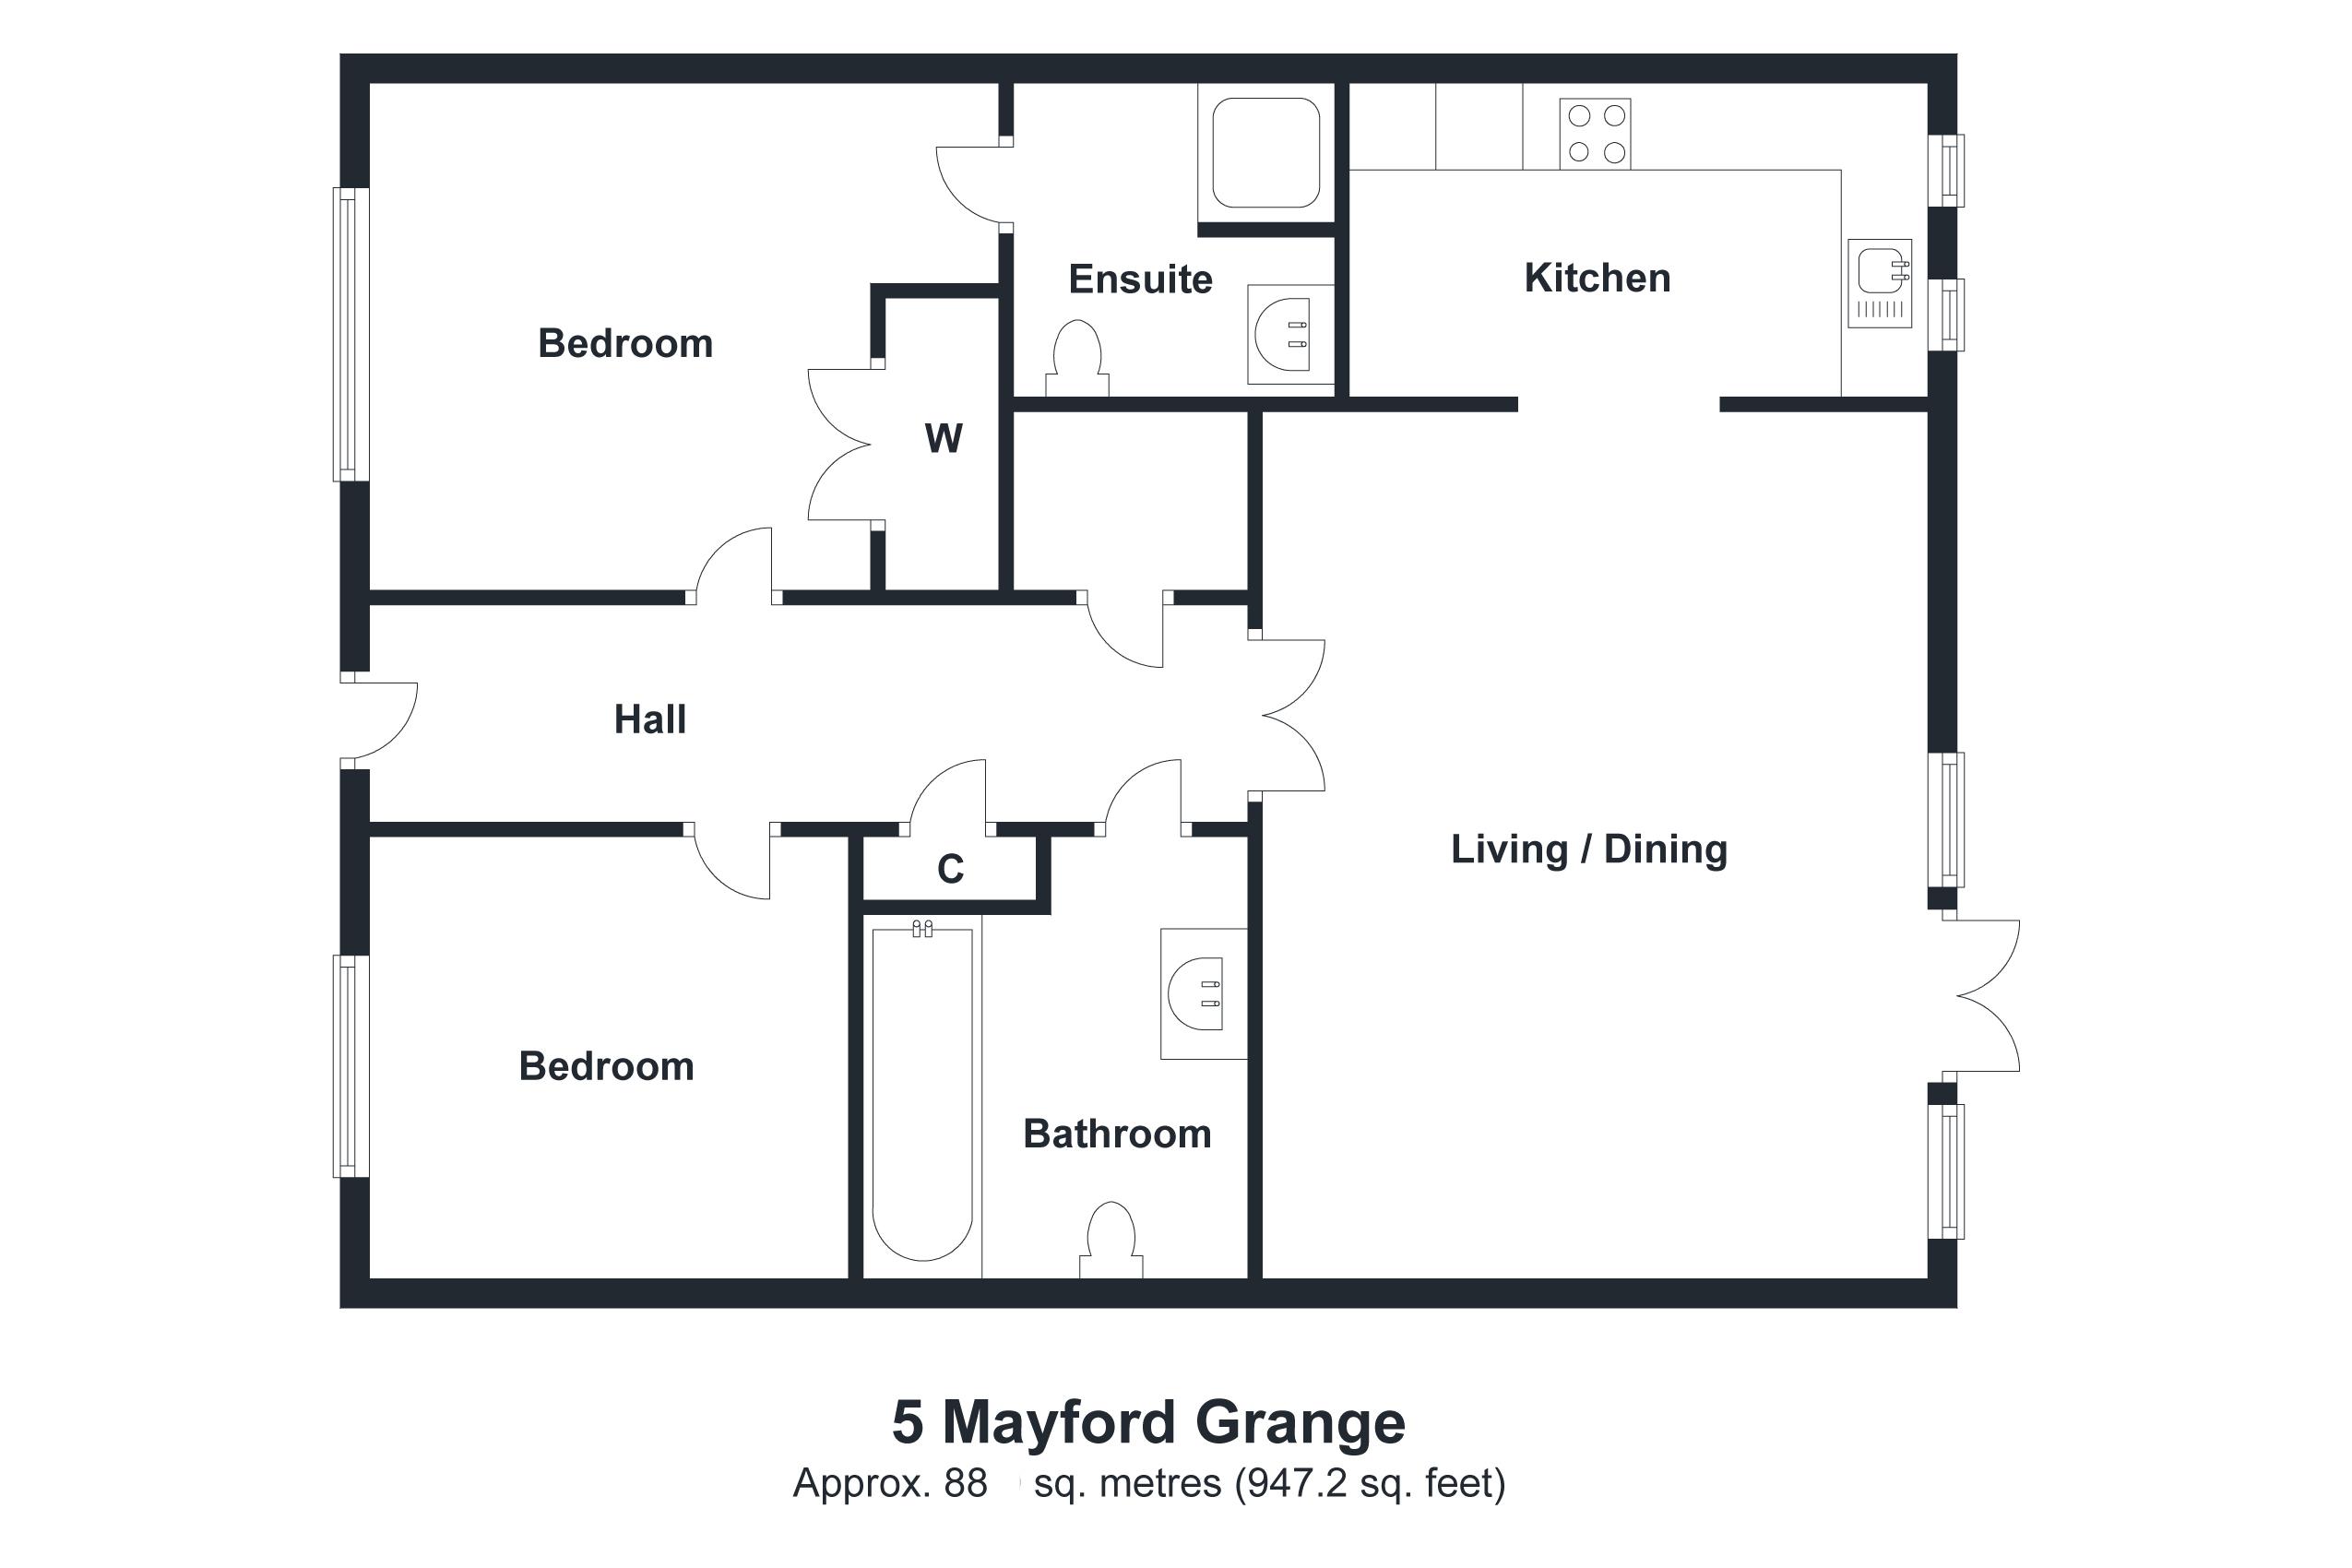 5 Mayford Grange Floorplan